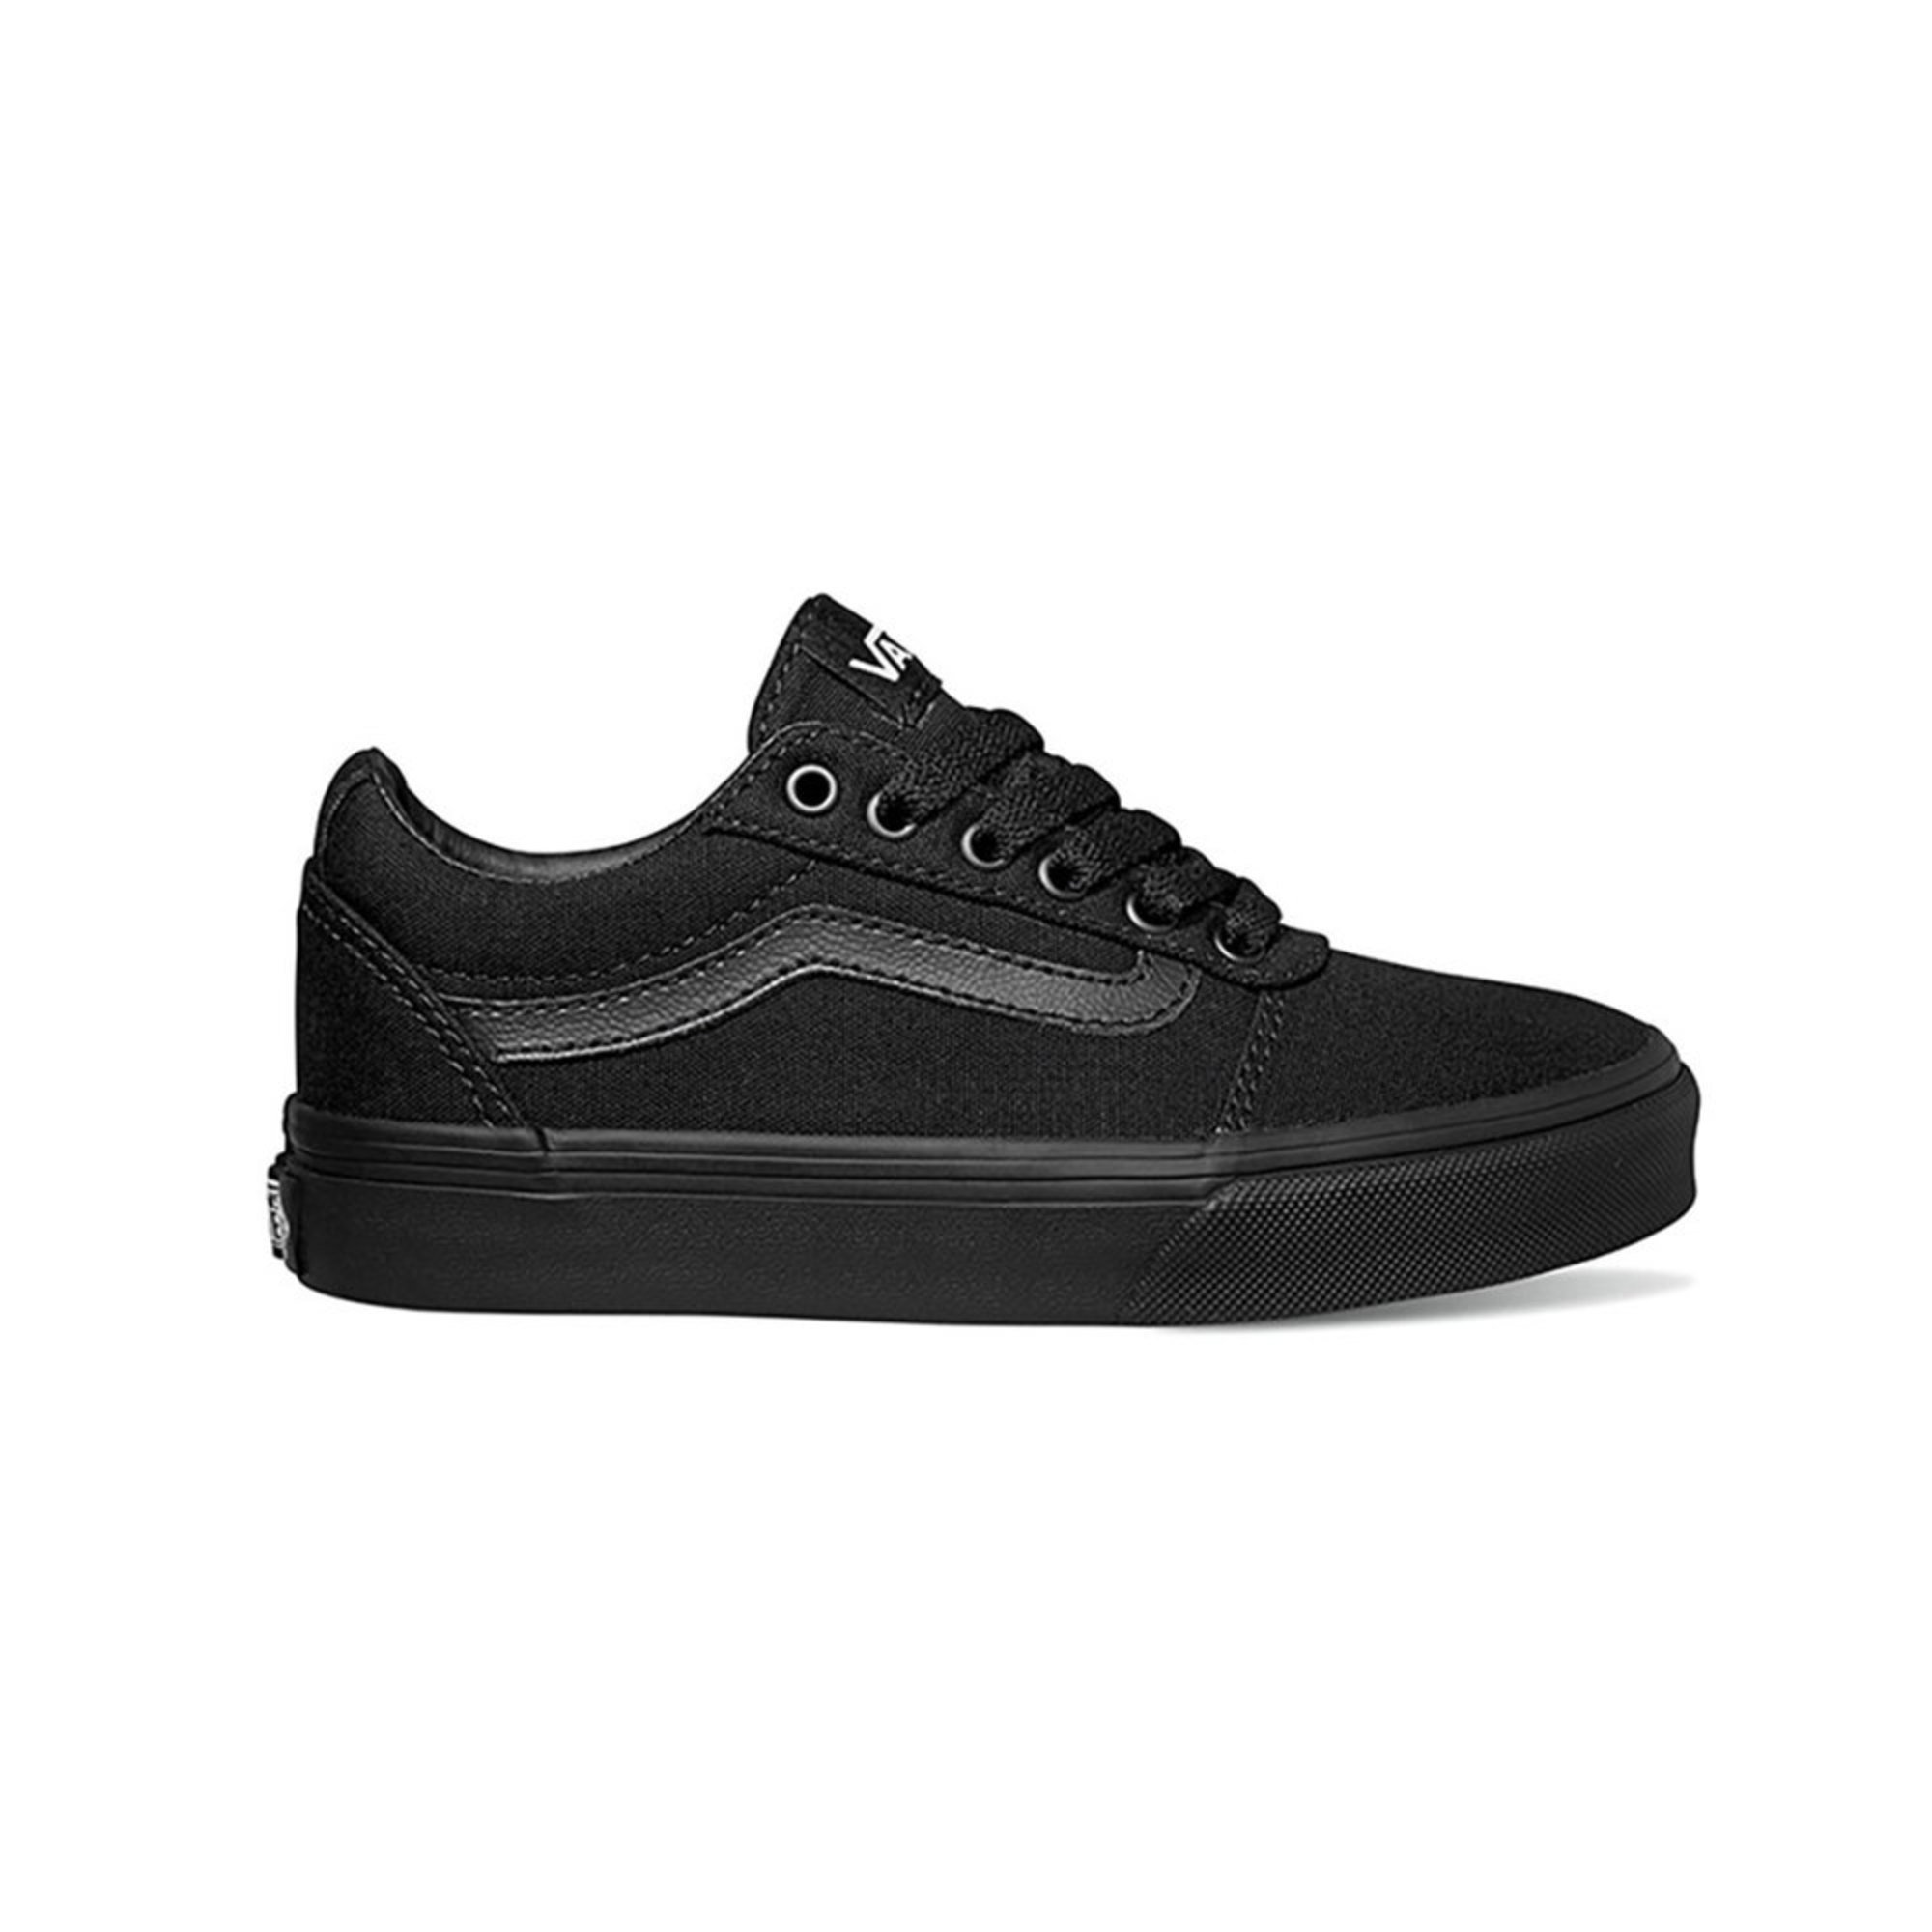 4fe04d9ee933 Vans Boys Yt Ward Canvas Sneaker (youth)